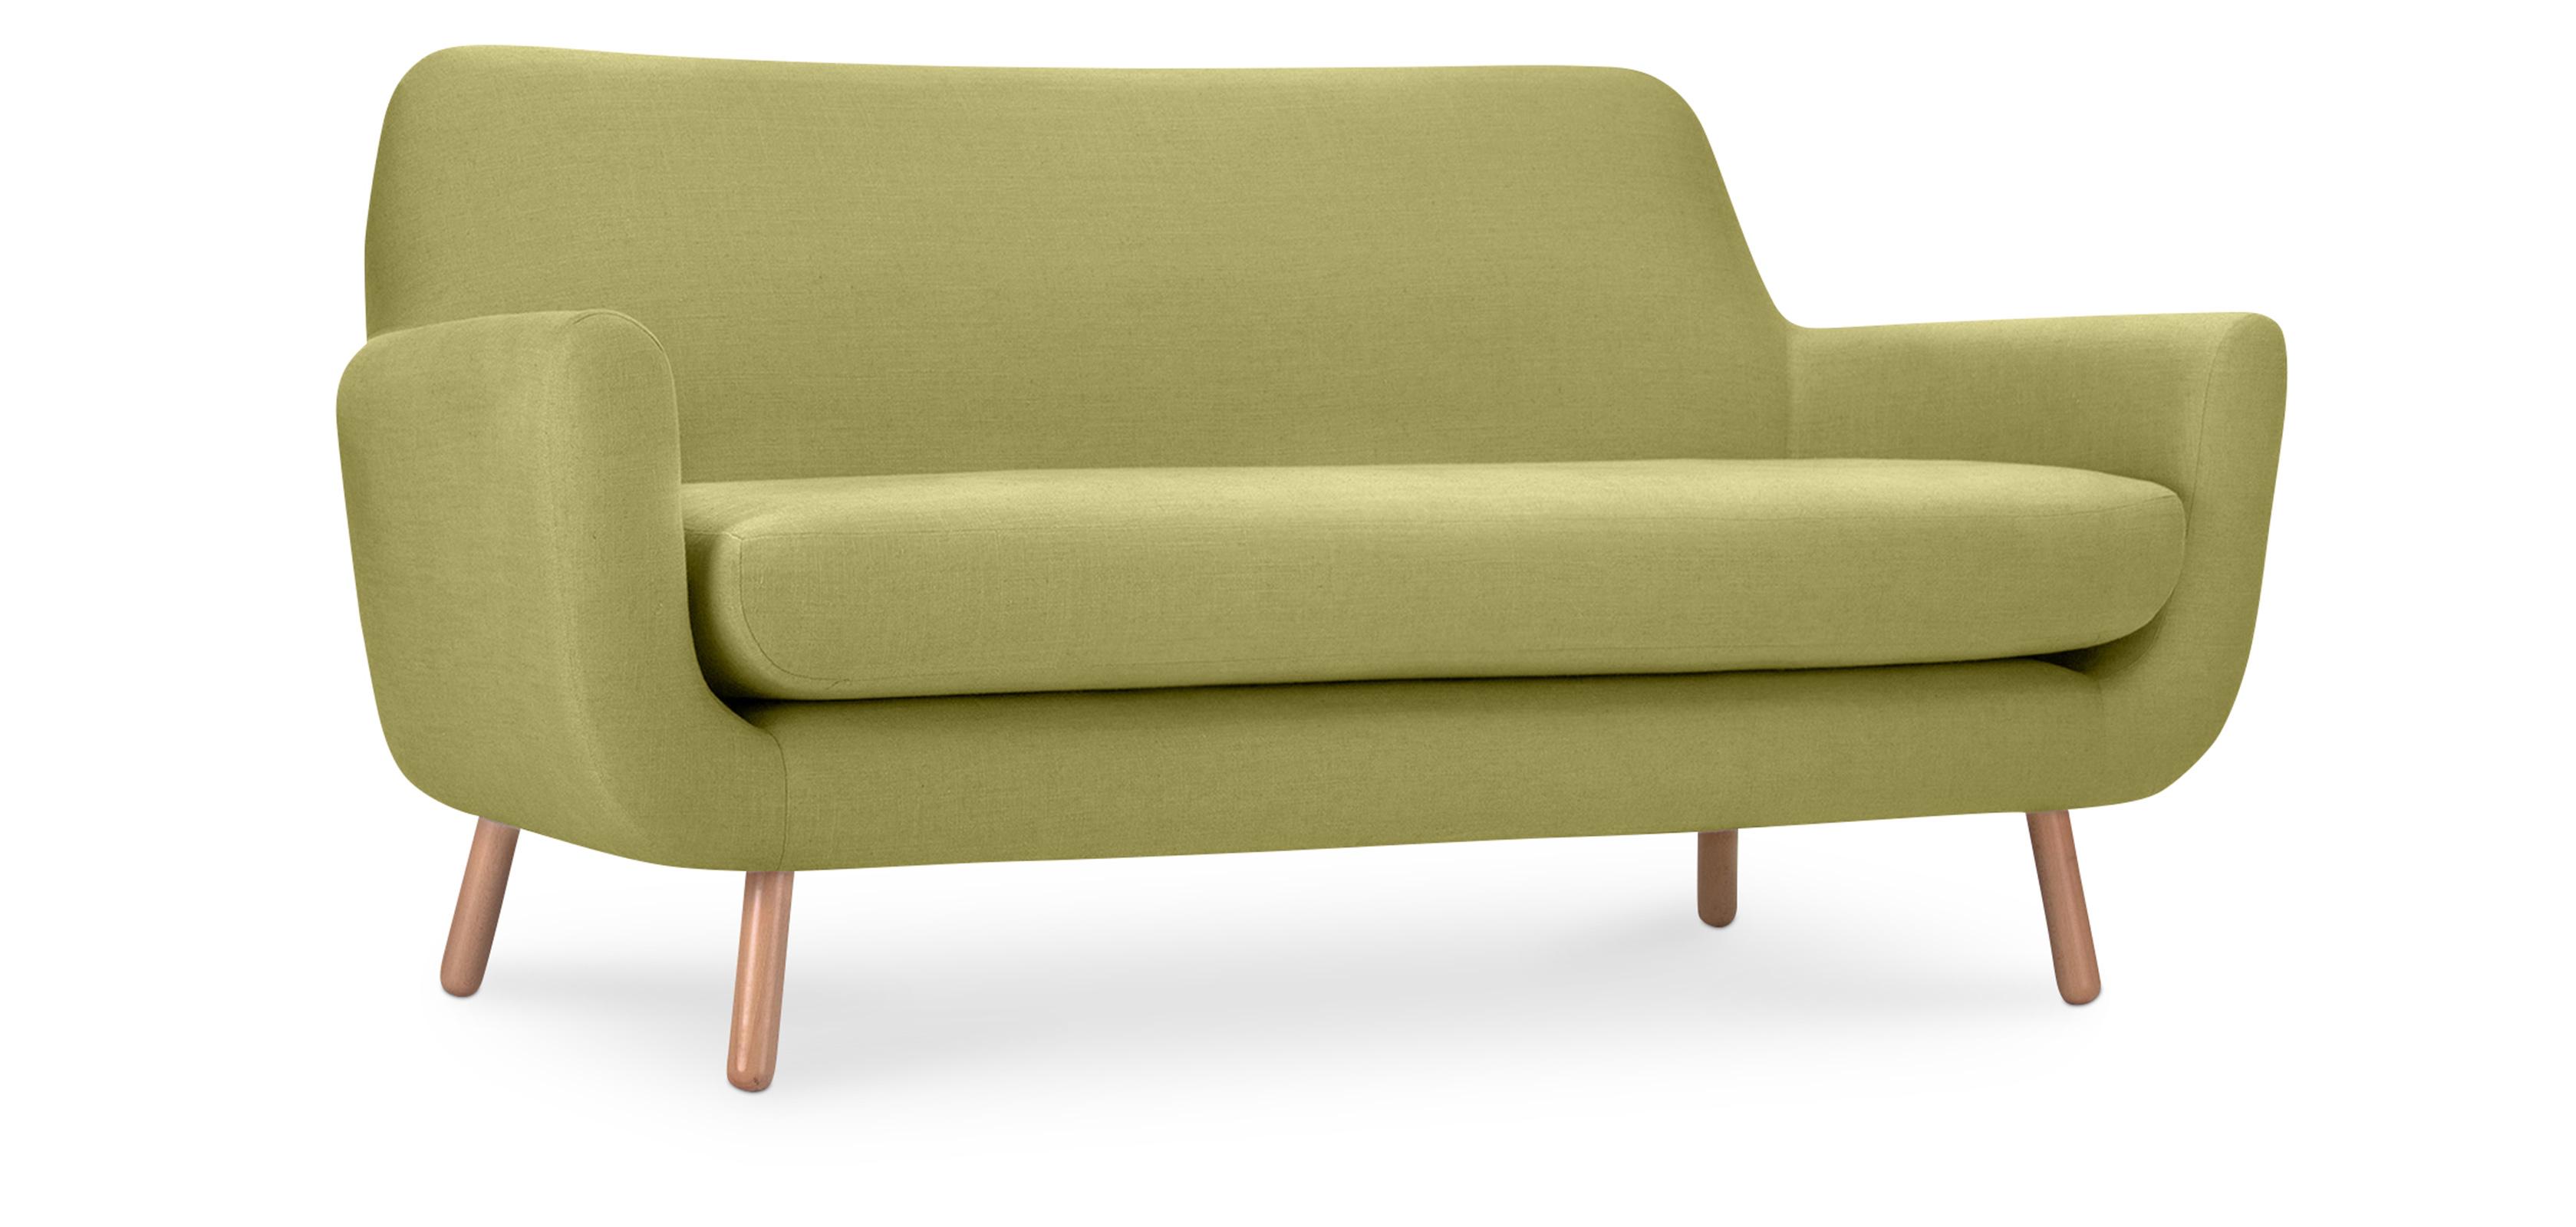 Skandinavisches Design 2-Sitzer Jonaasah Sofa - Stoff